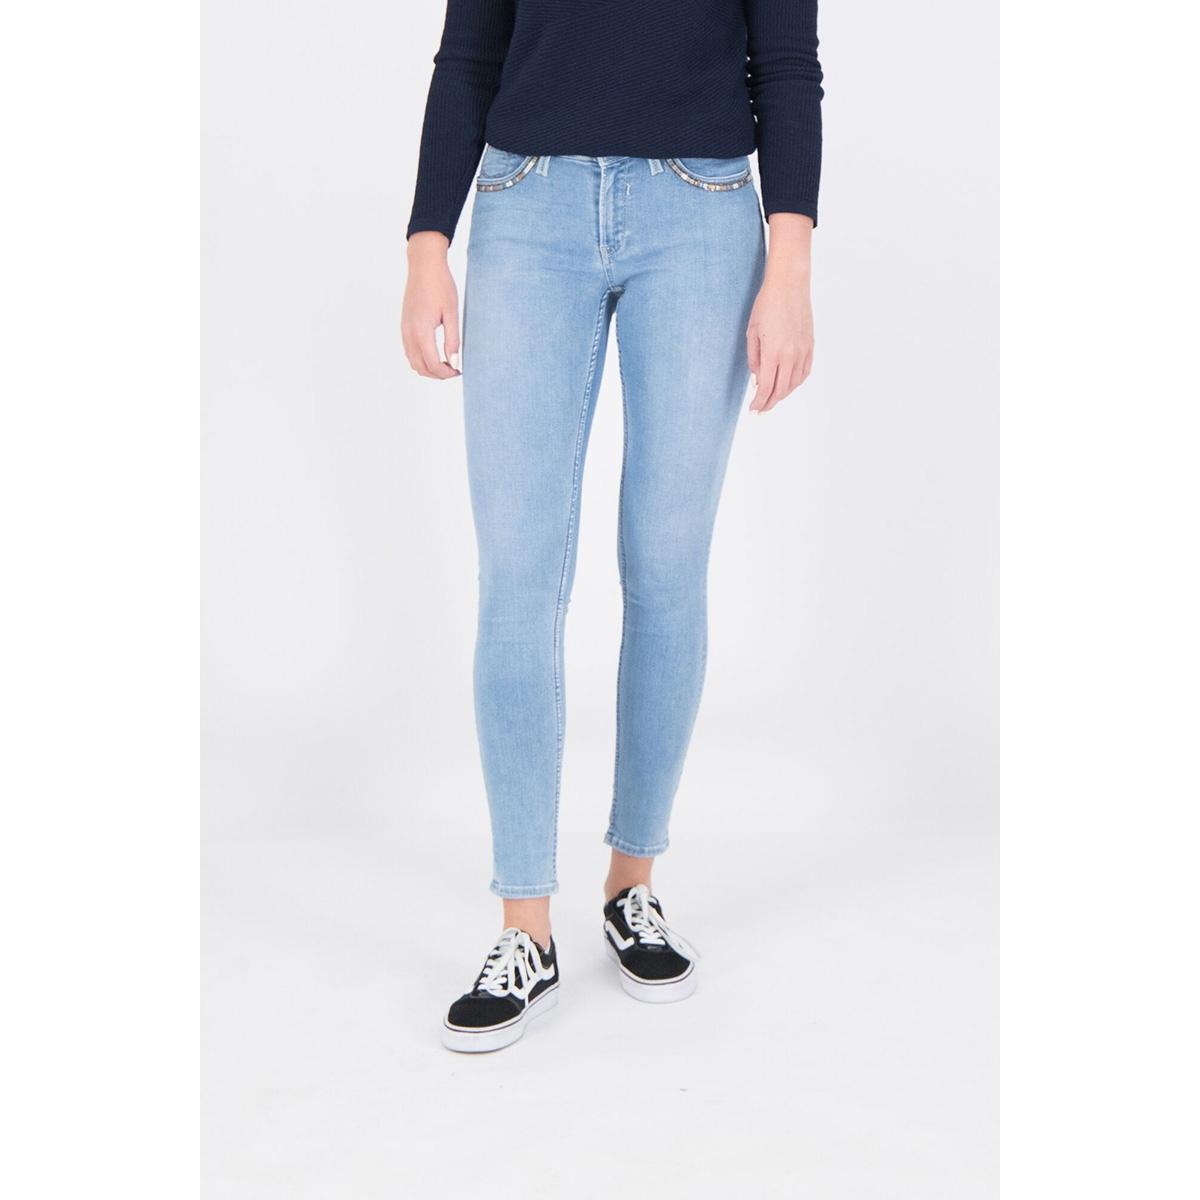 rachelle super slim jeans gs000117 garcia jeans 6420 light used